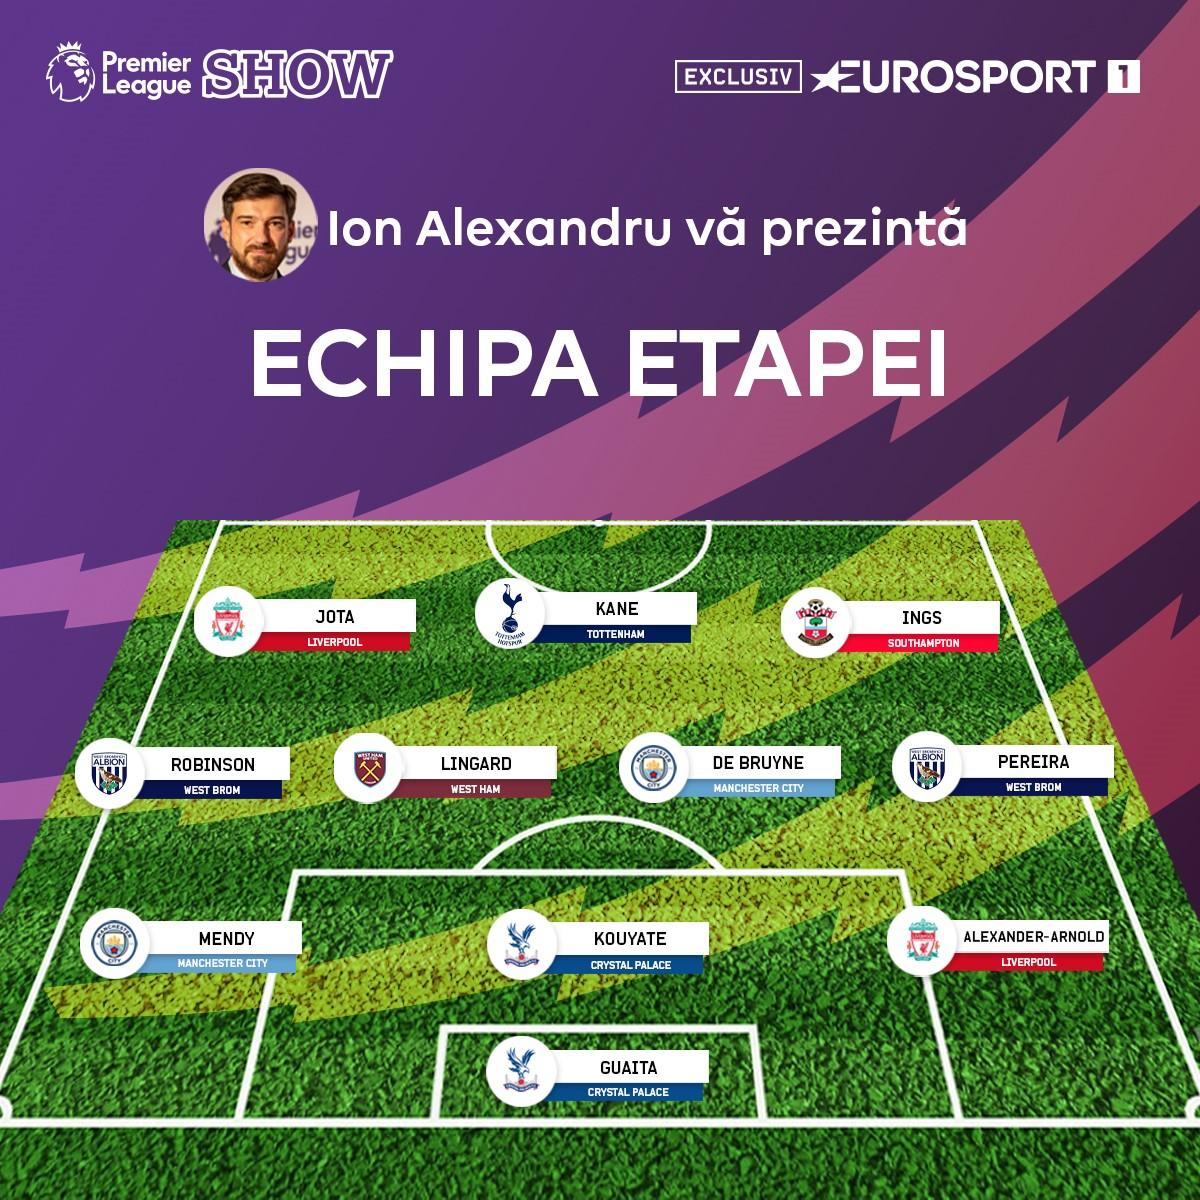 https://i.eurosport.com/2021/04/06/3024077.jpg